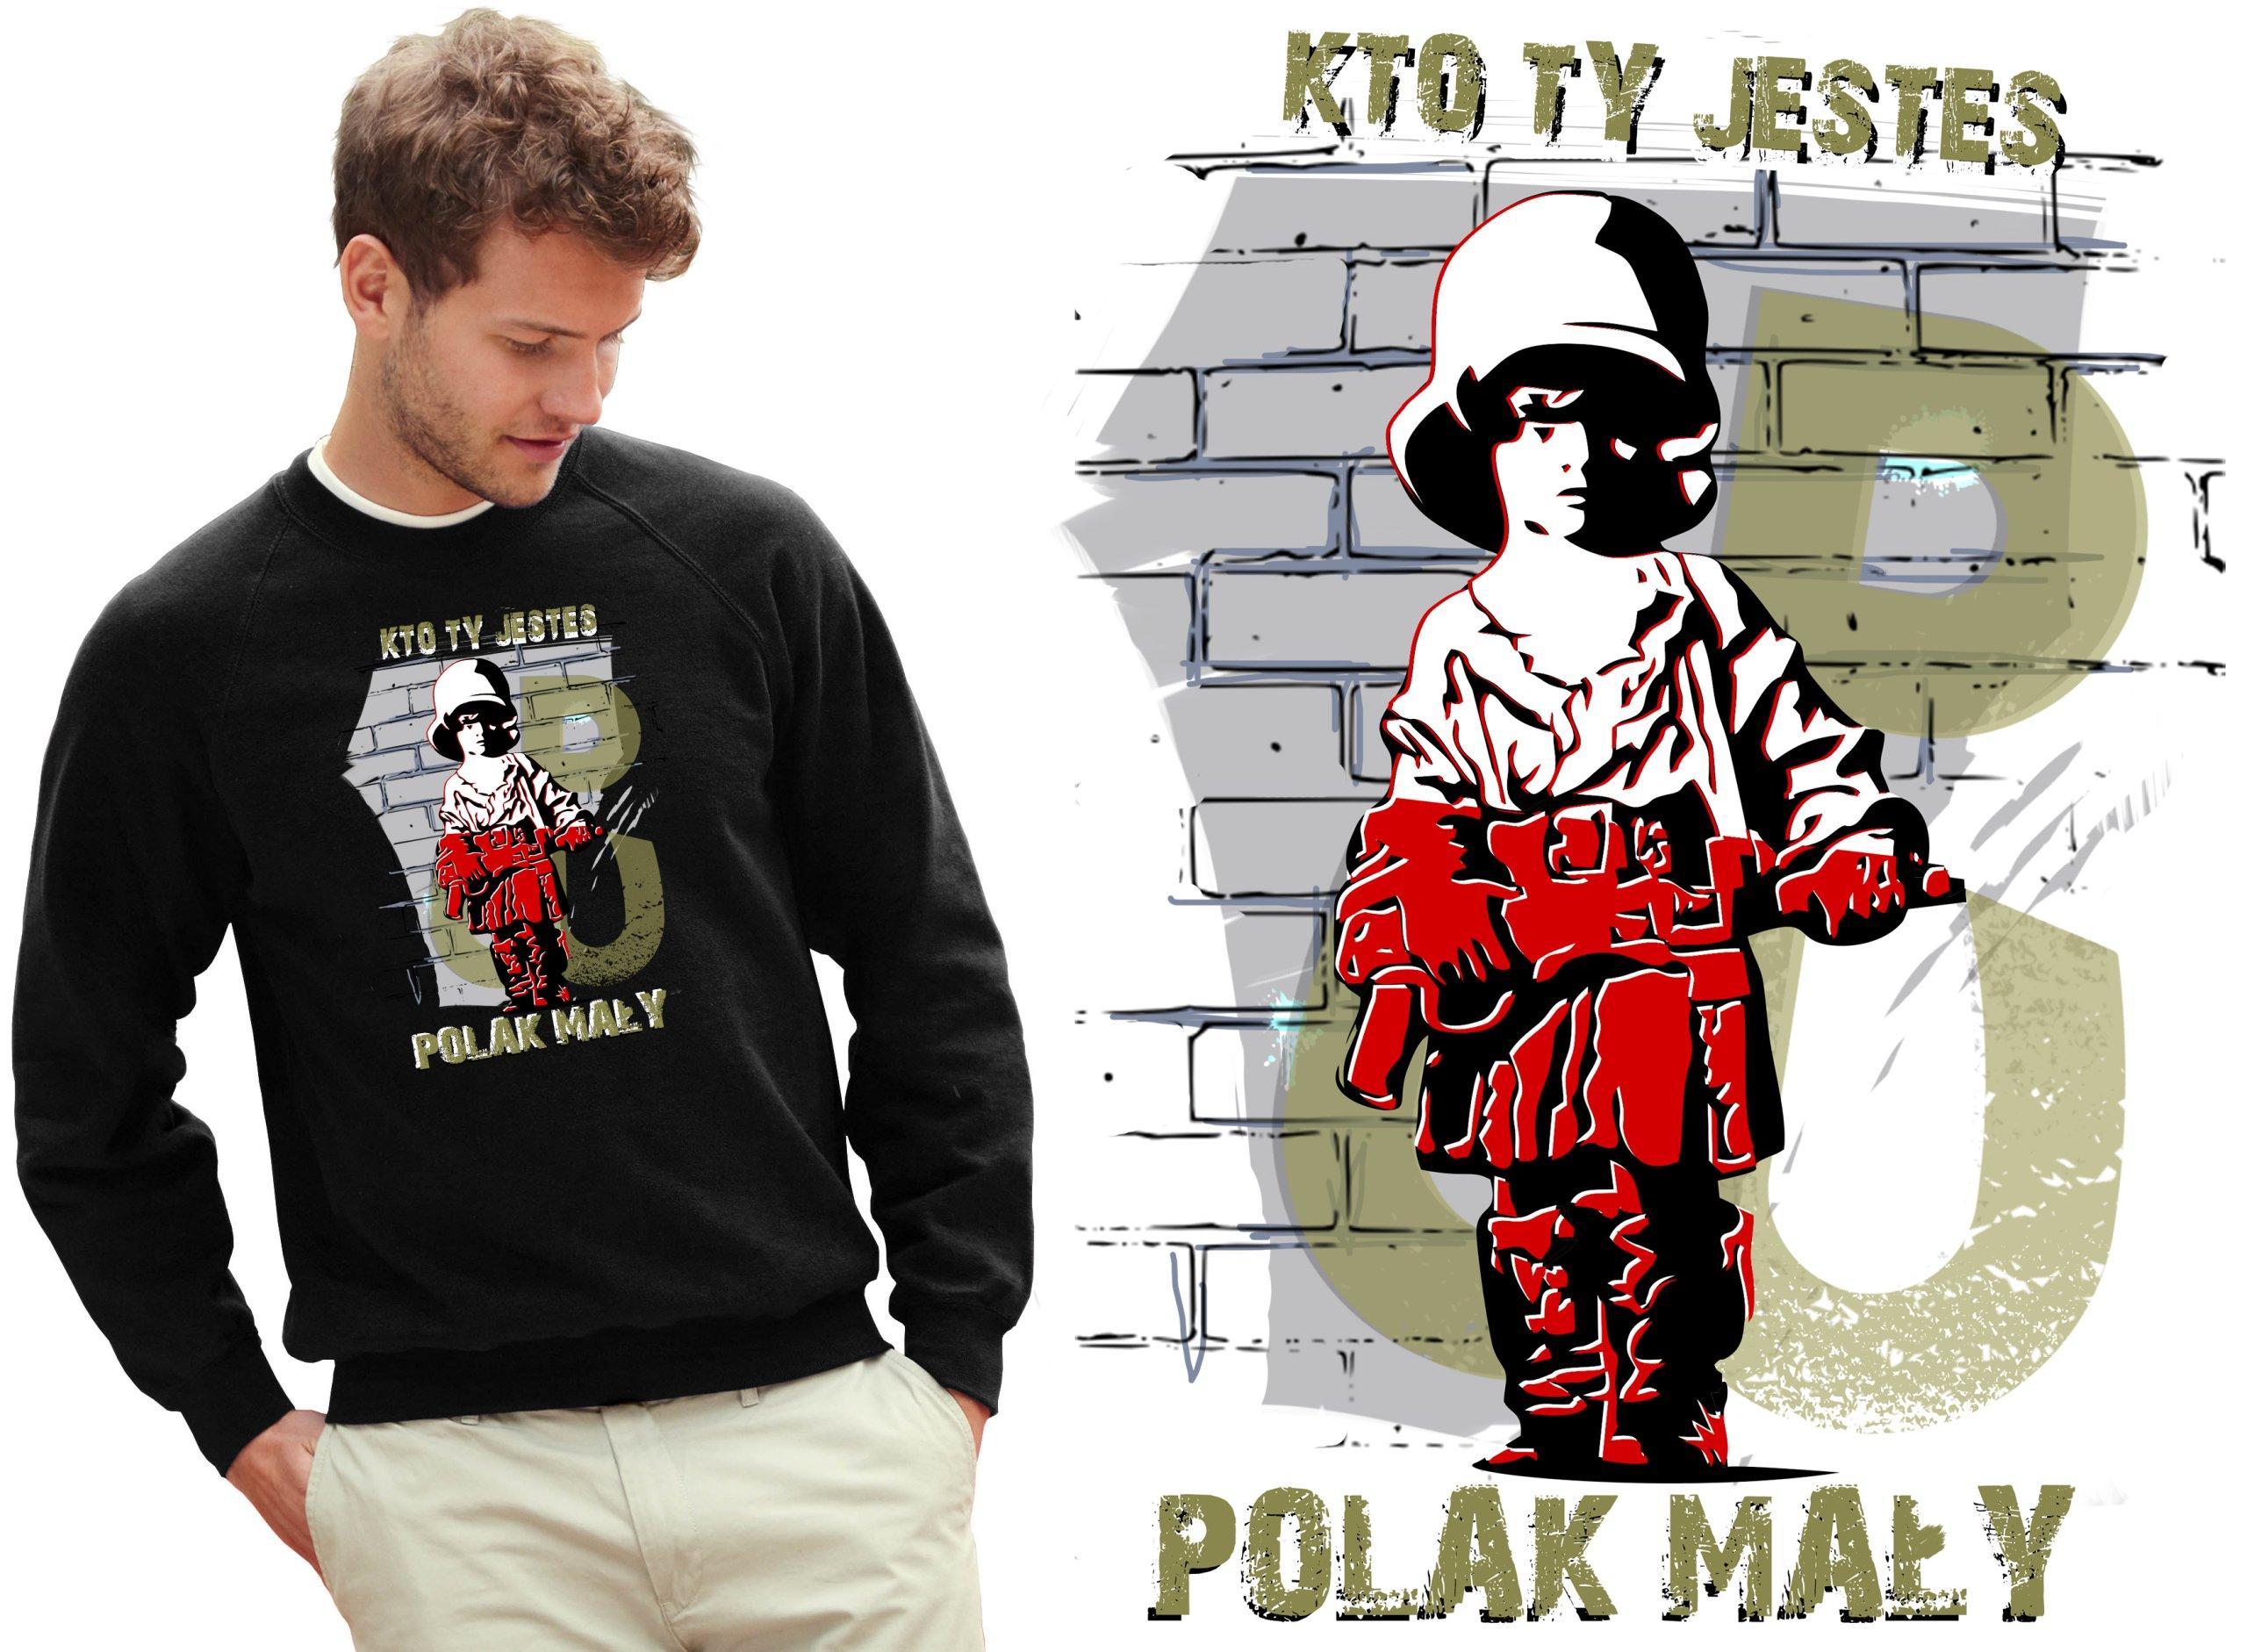 Bluzy Patriotyczne Patriota Polska Wzory L 5702578281 Allegro Pl